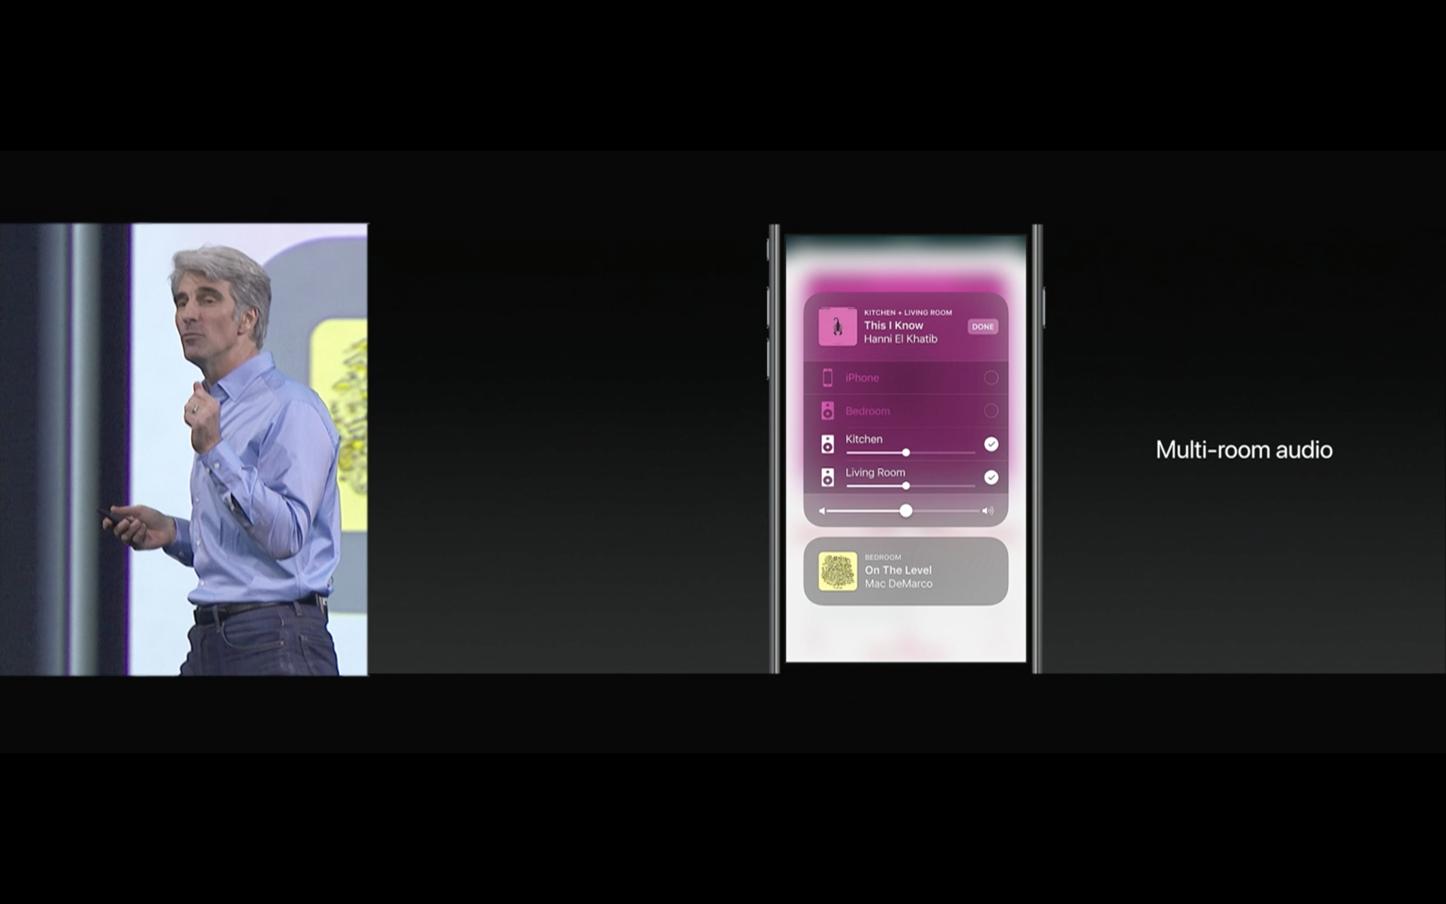 iOS11-2017-WWDC17-57.png